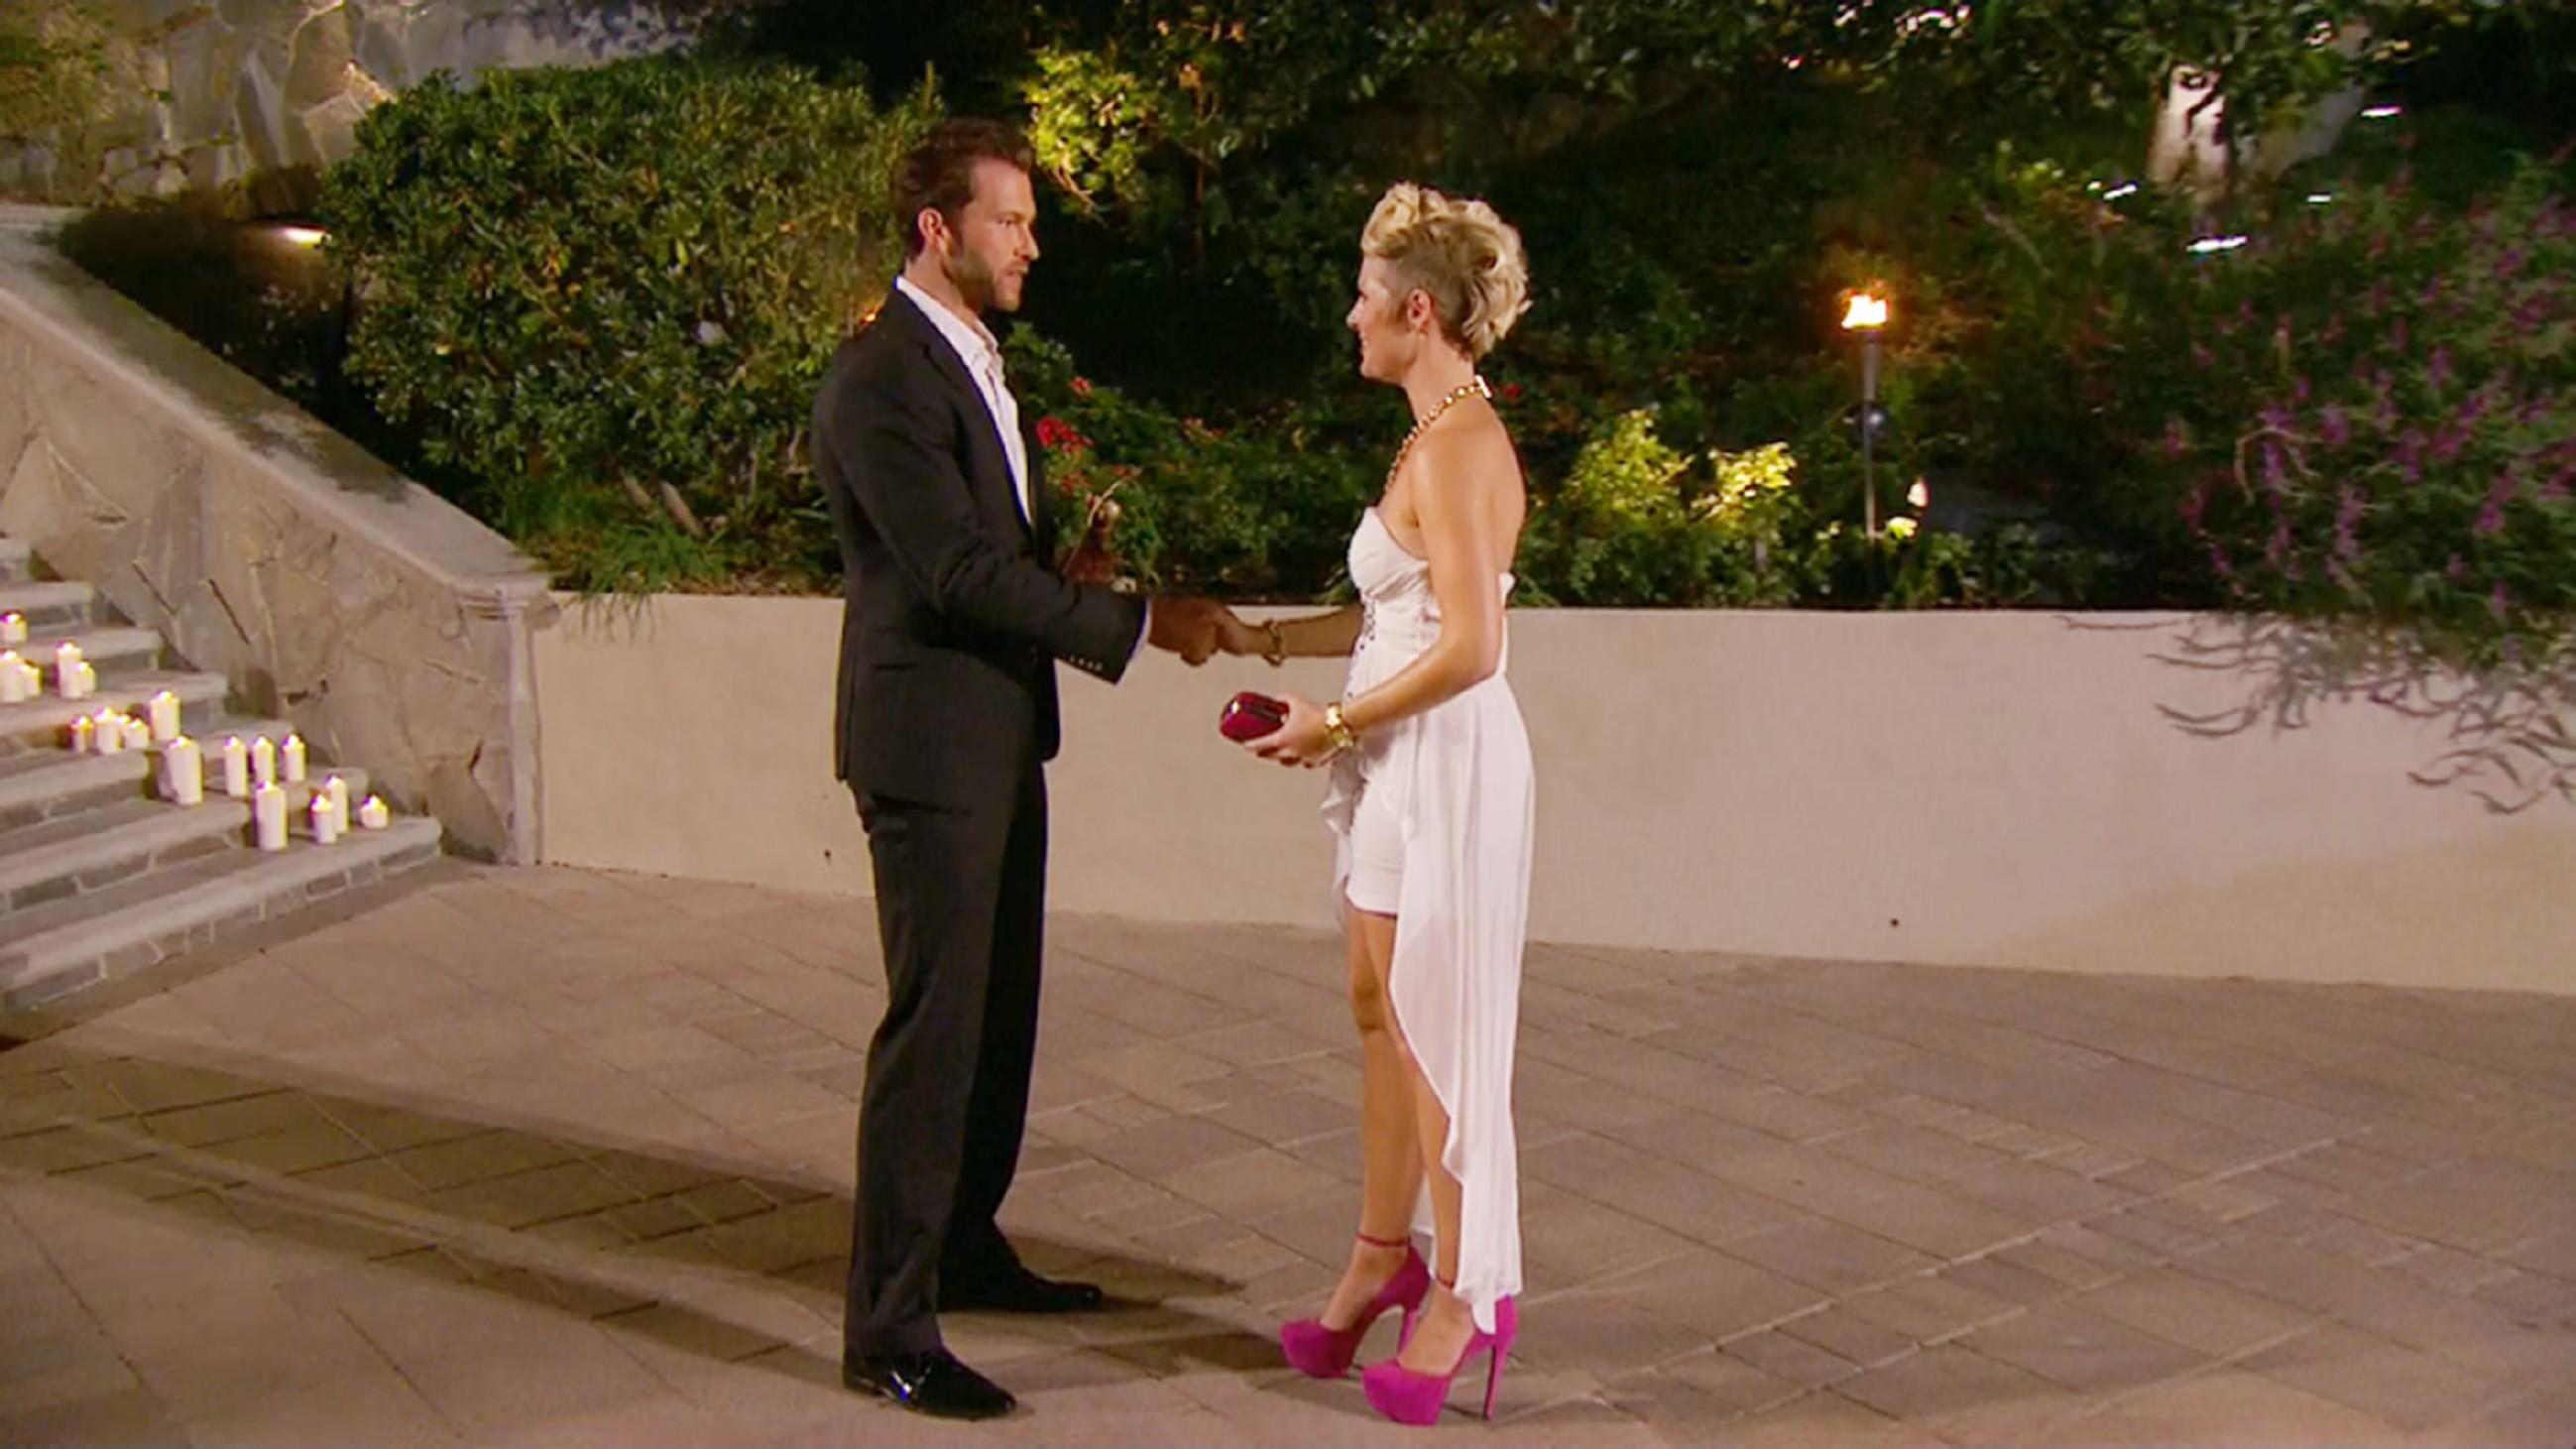 Der Bachelor 2015 - Folge 1 - Annamarie